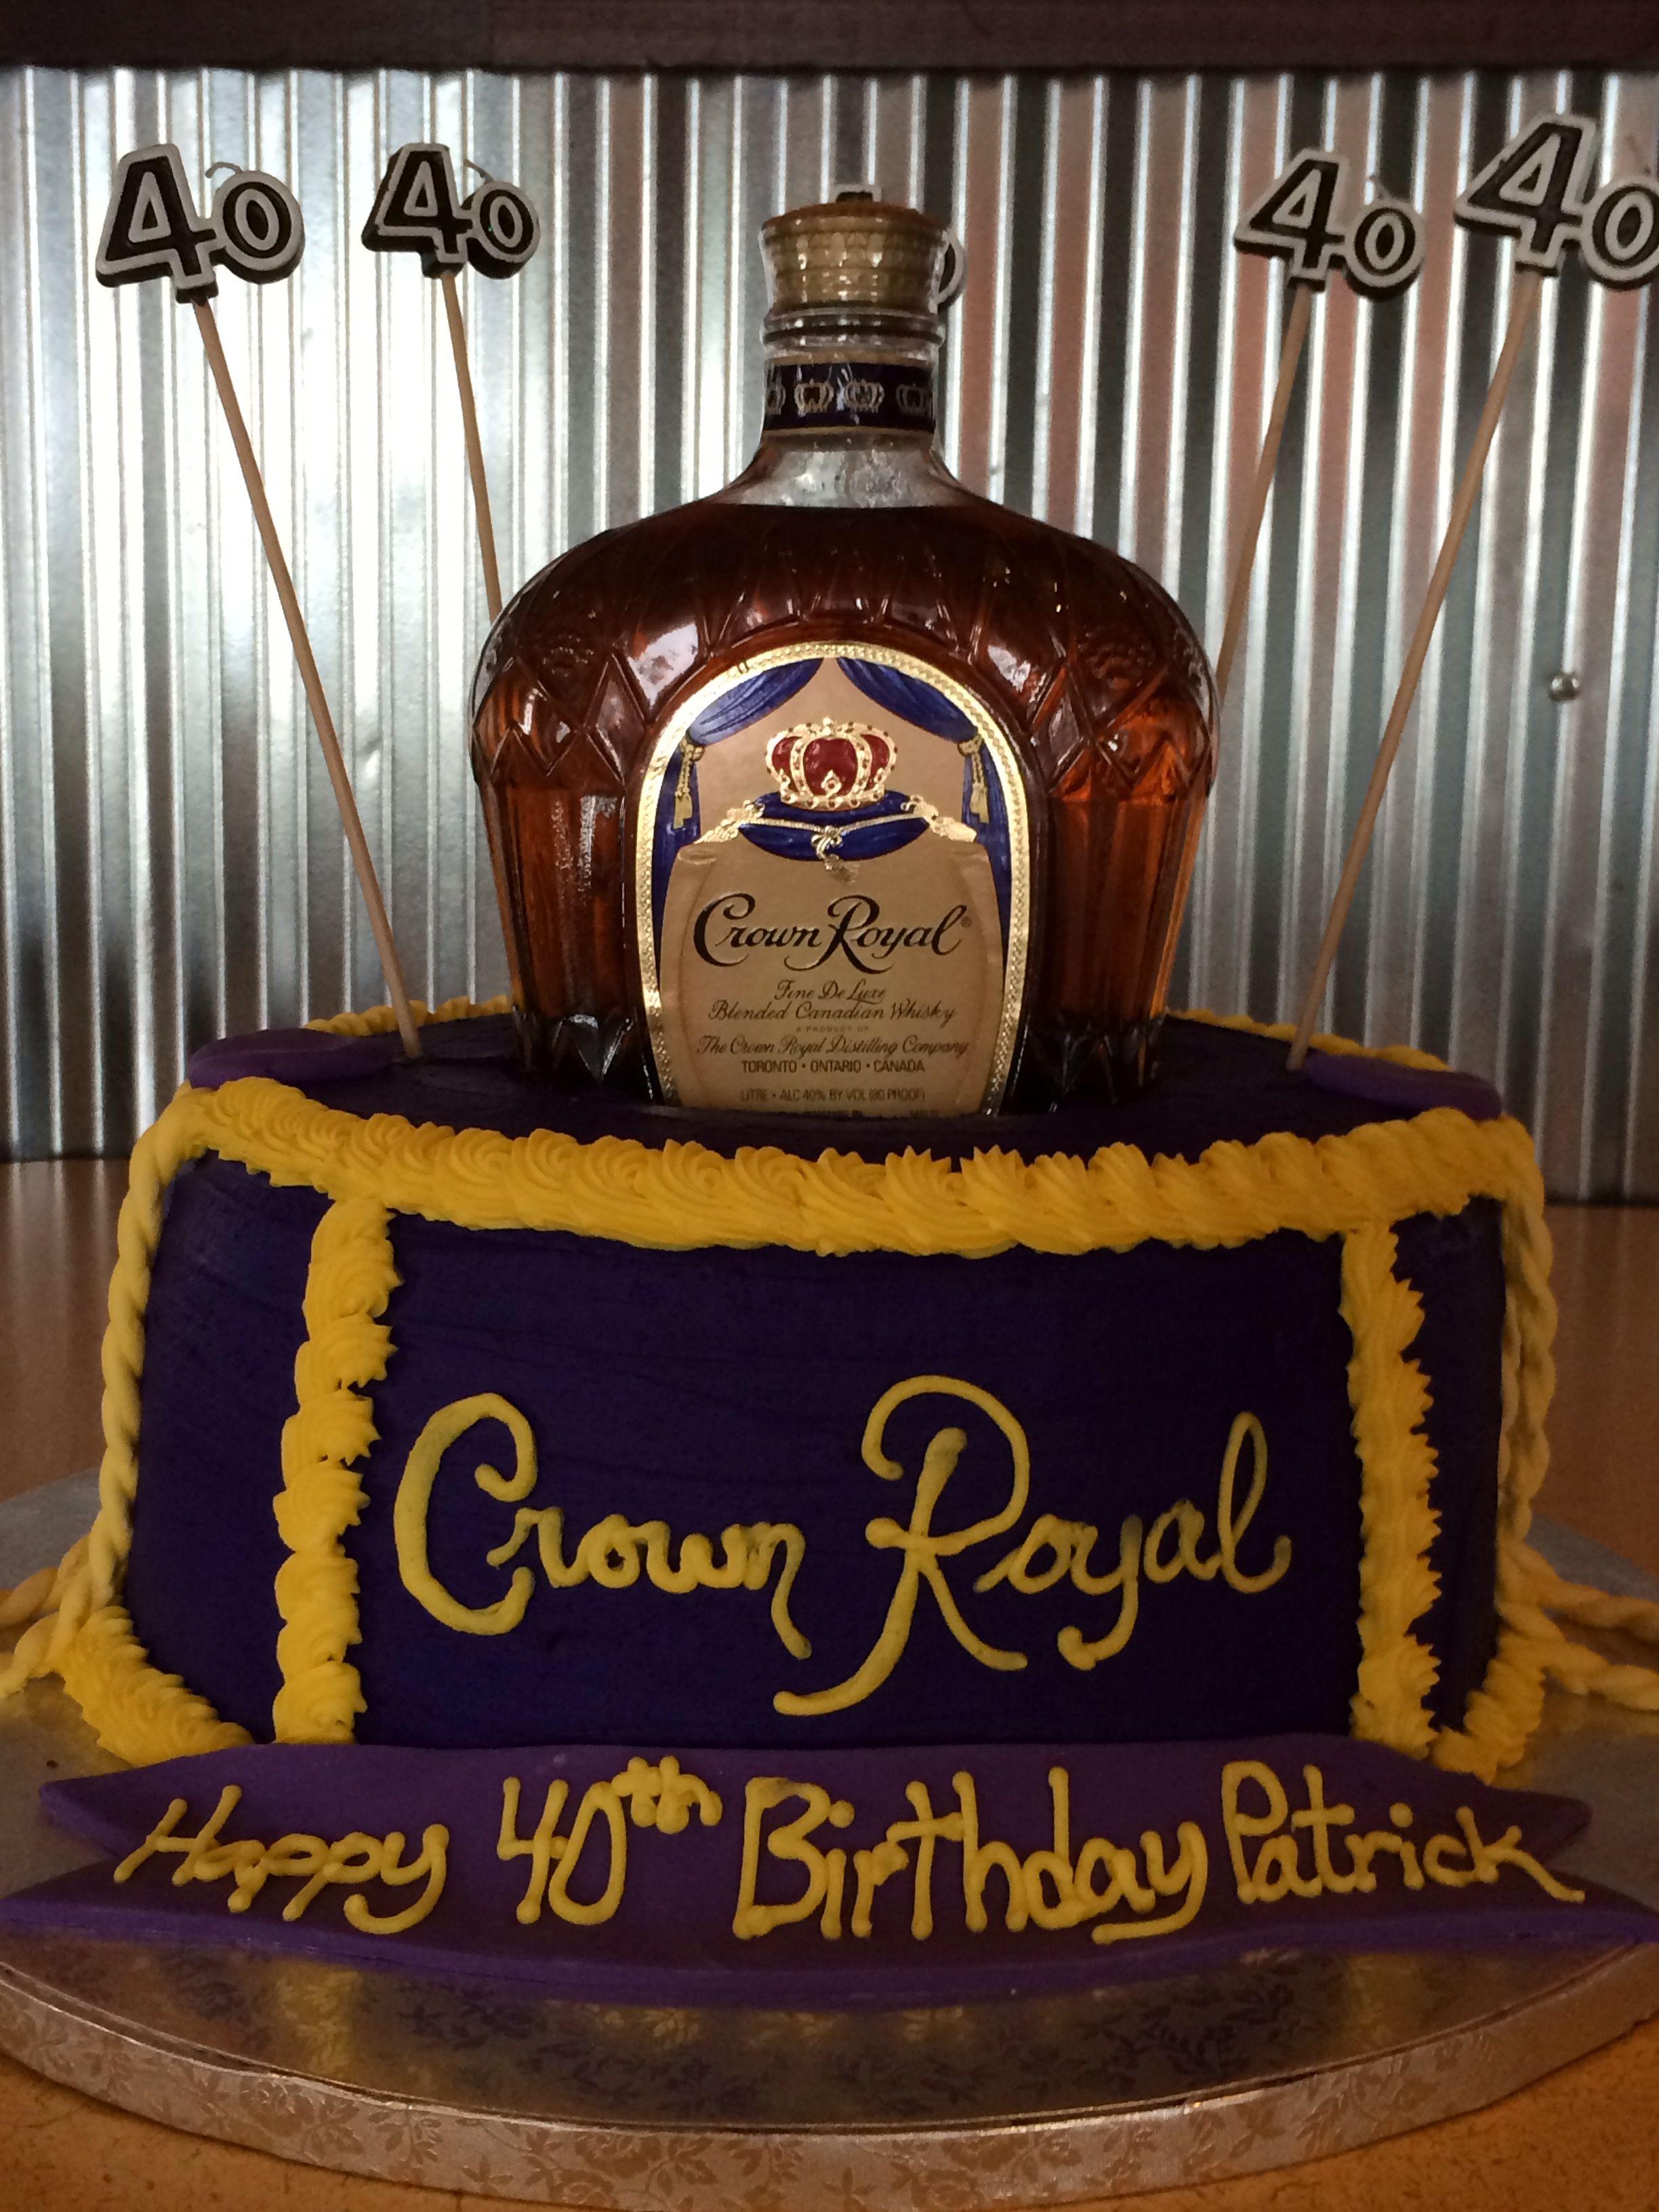 Crown Royal Birthday Cake Birthday Ideas Pinterest Cake